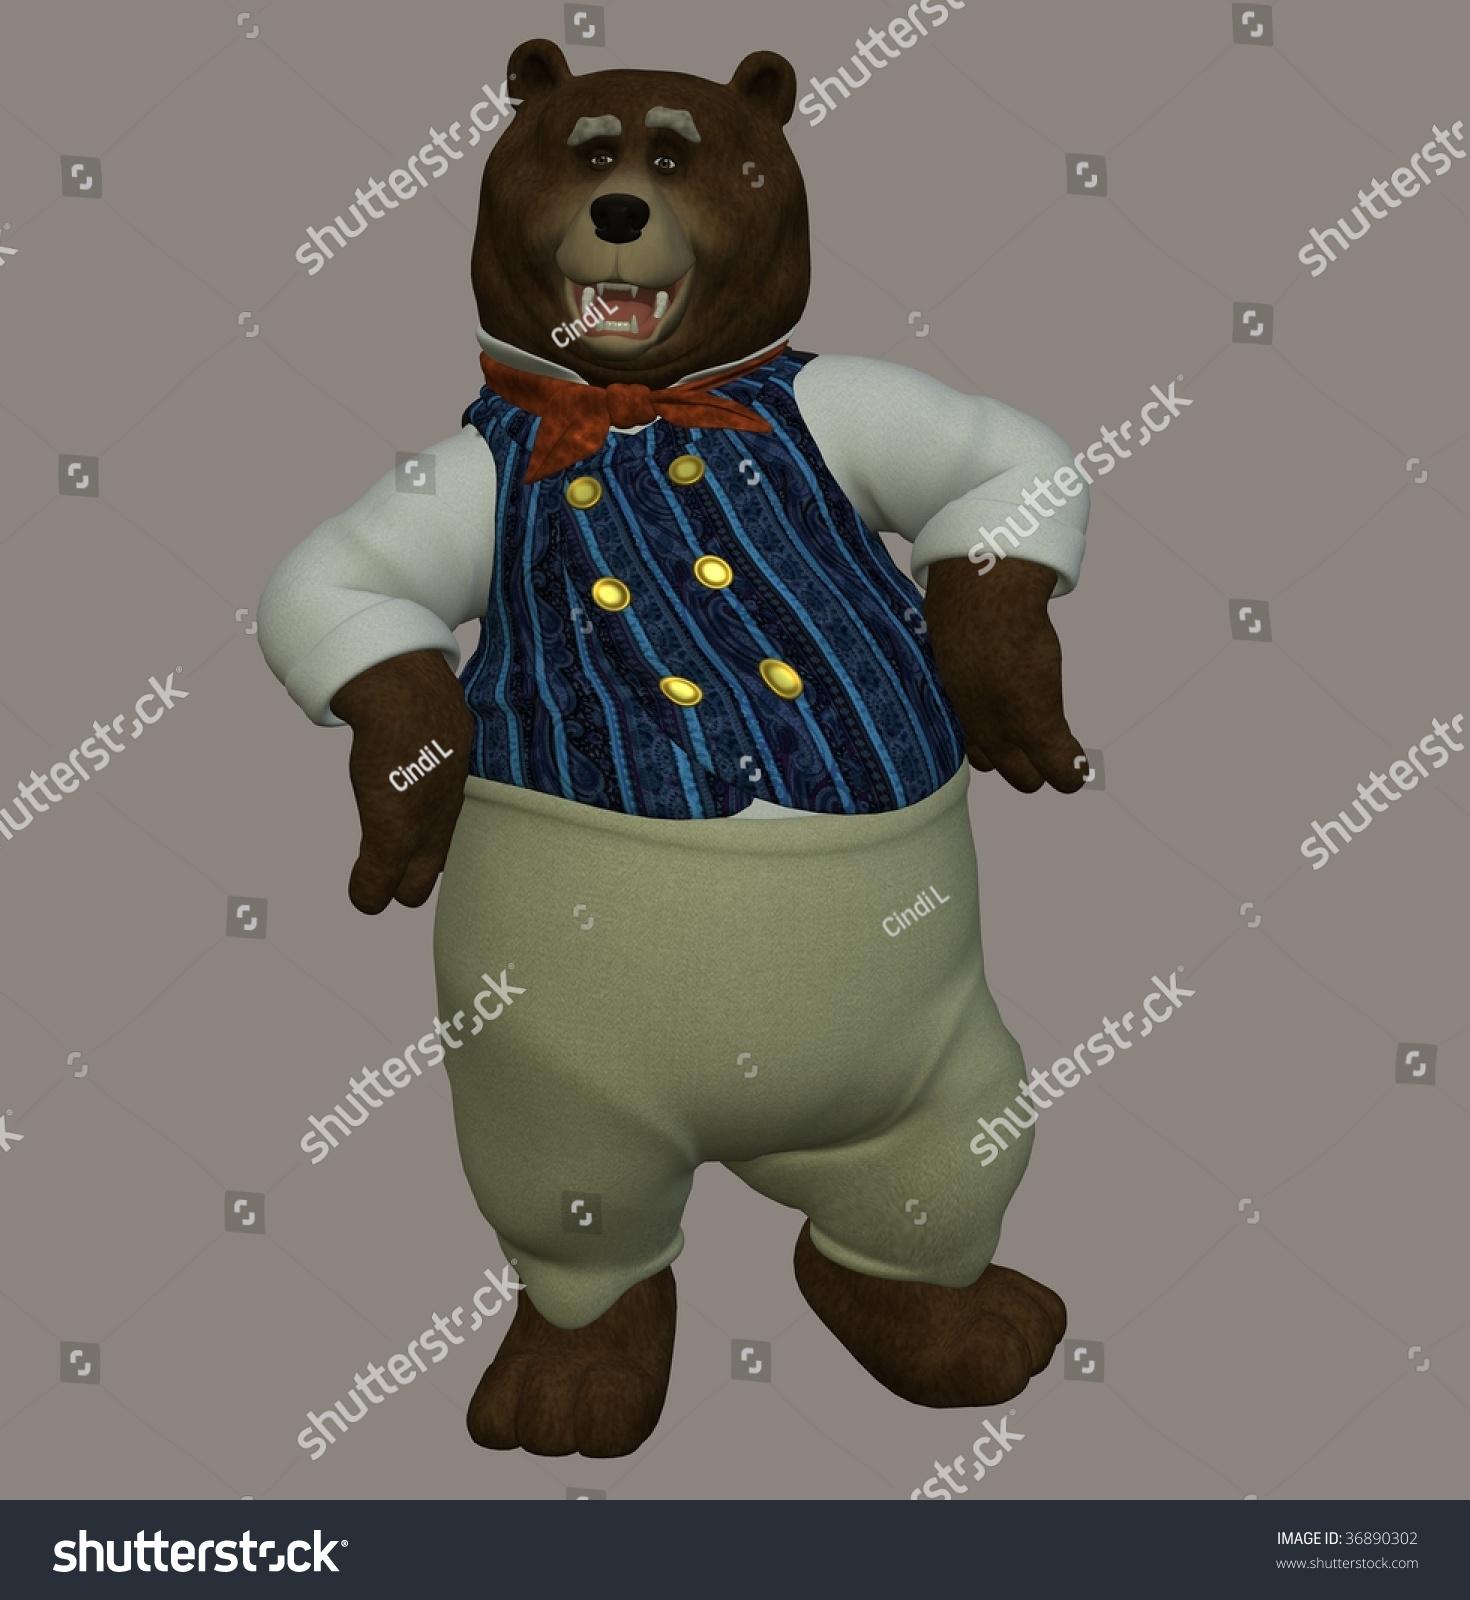 papa bear nursery rhyme three bears stock illustration 36890302